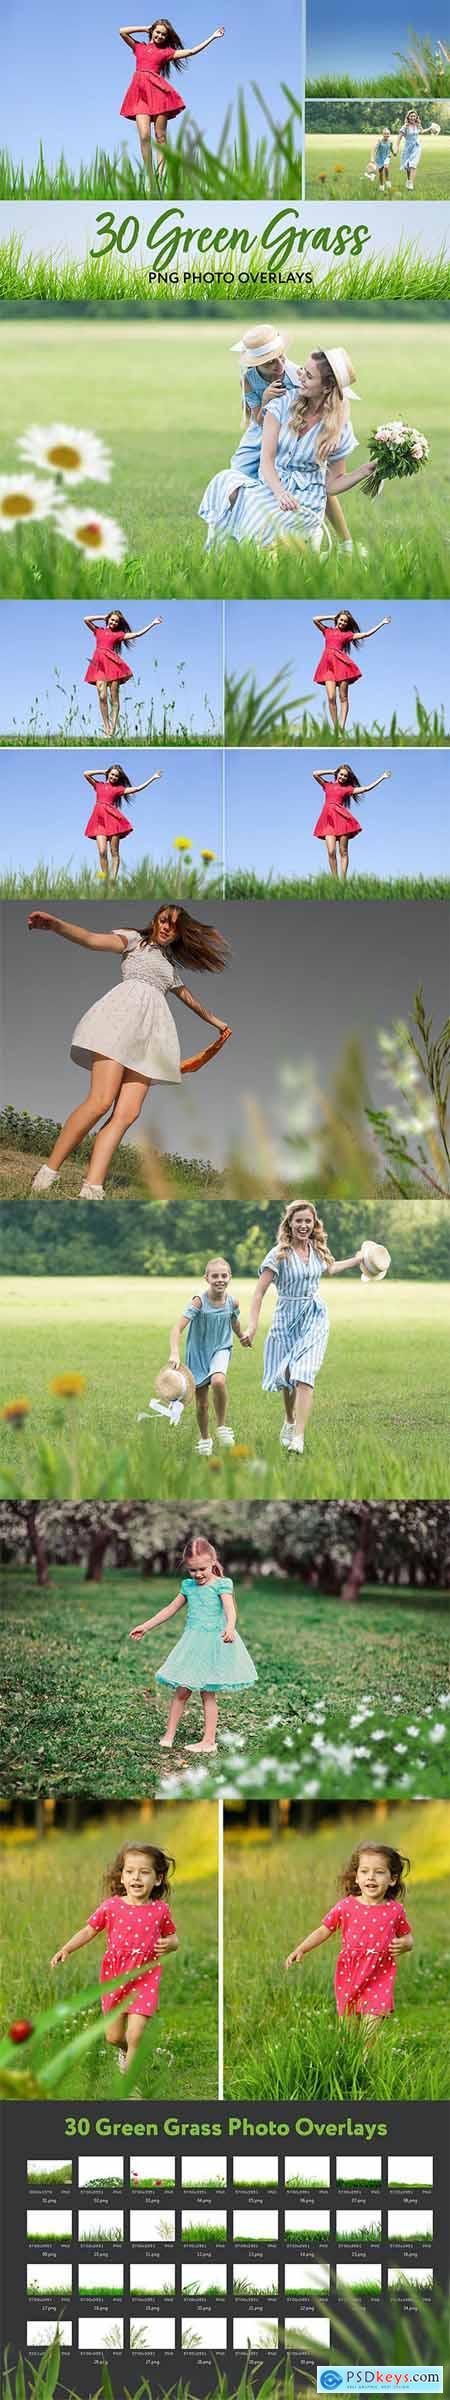 30 Green Grass Photo Overlays 26414686